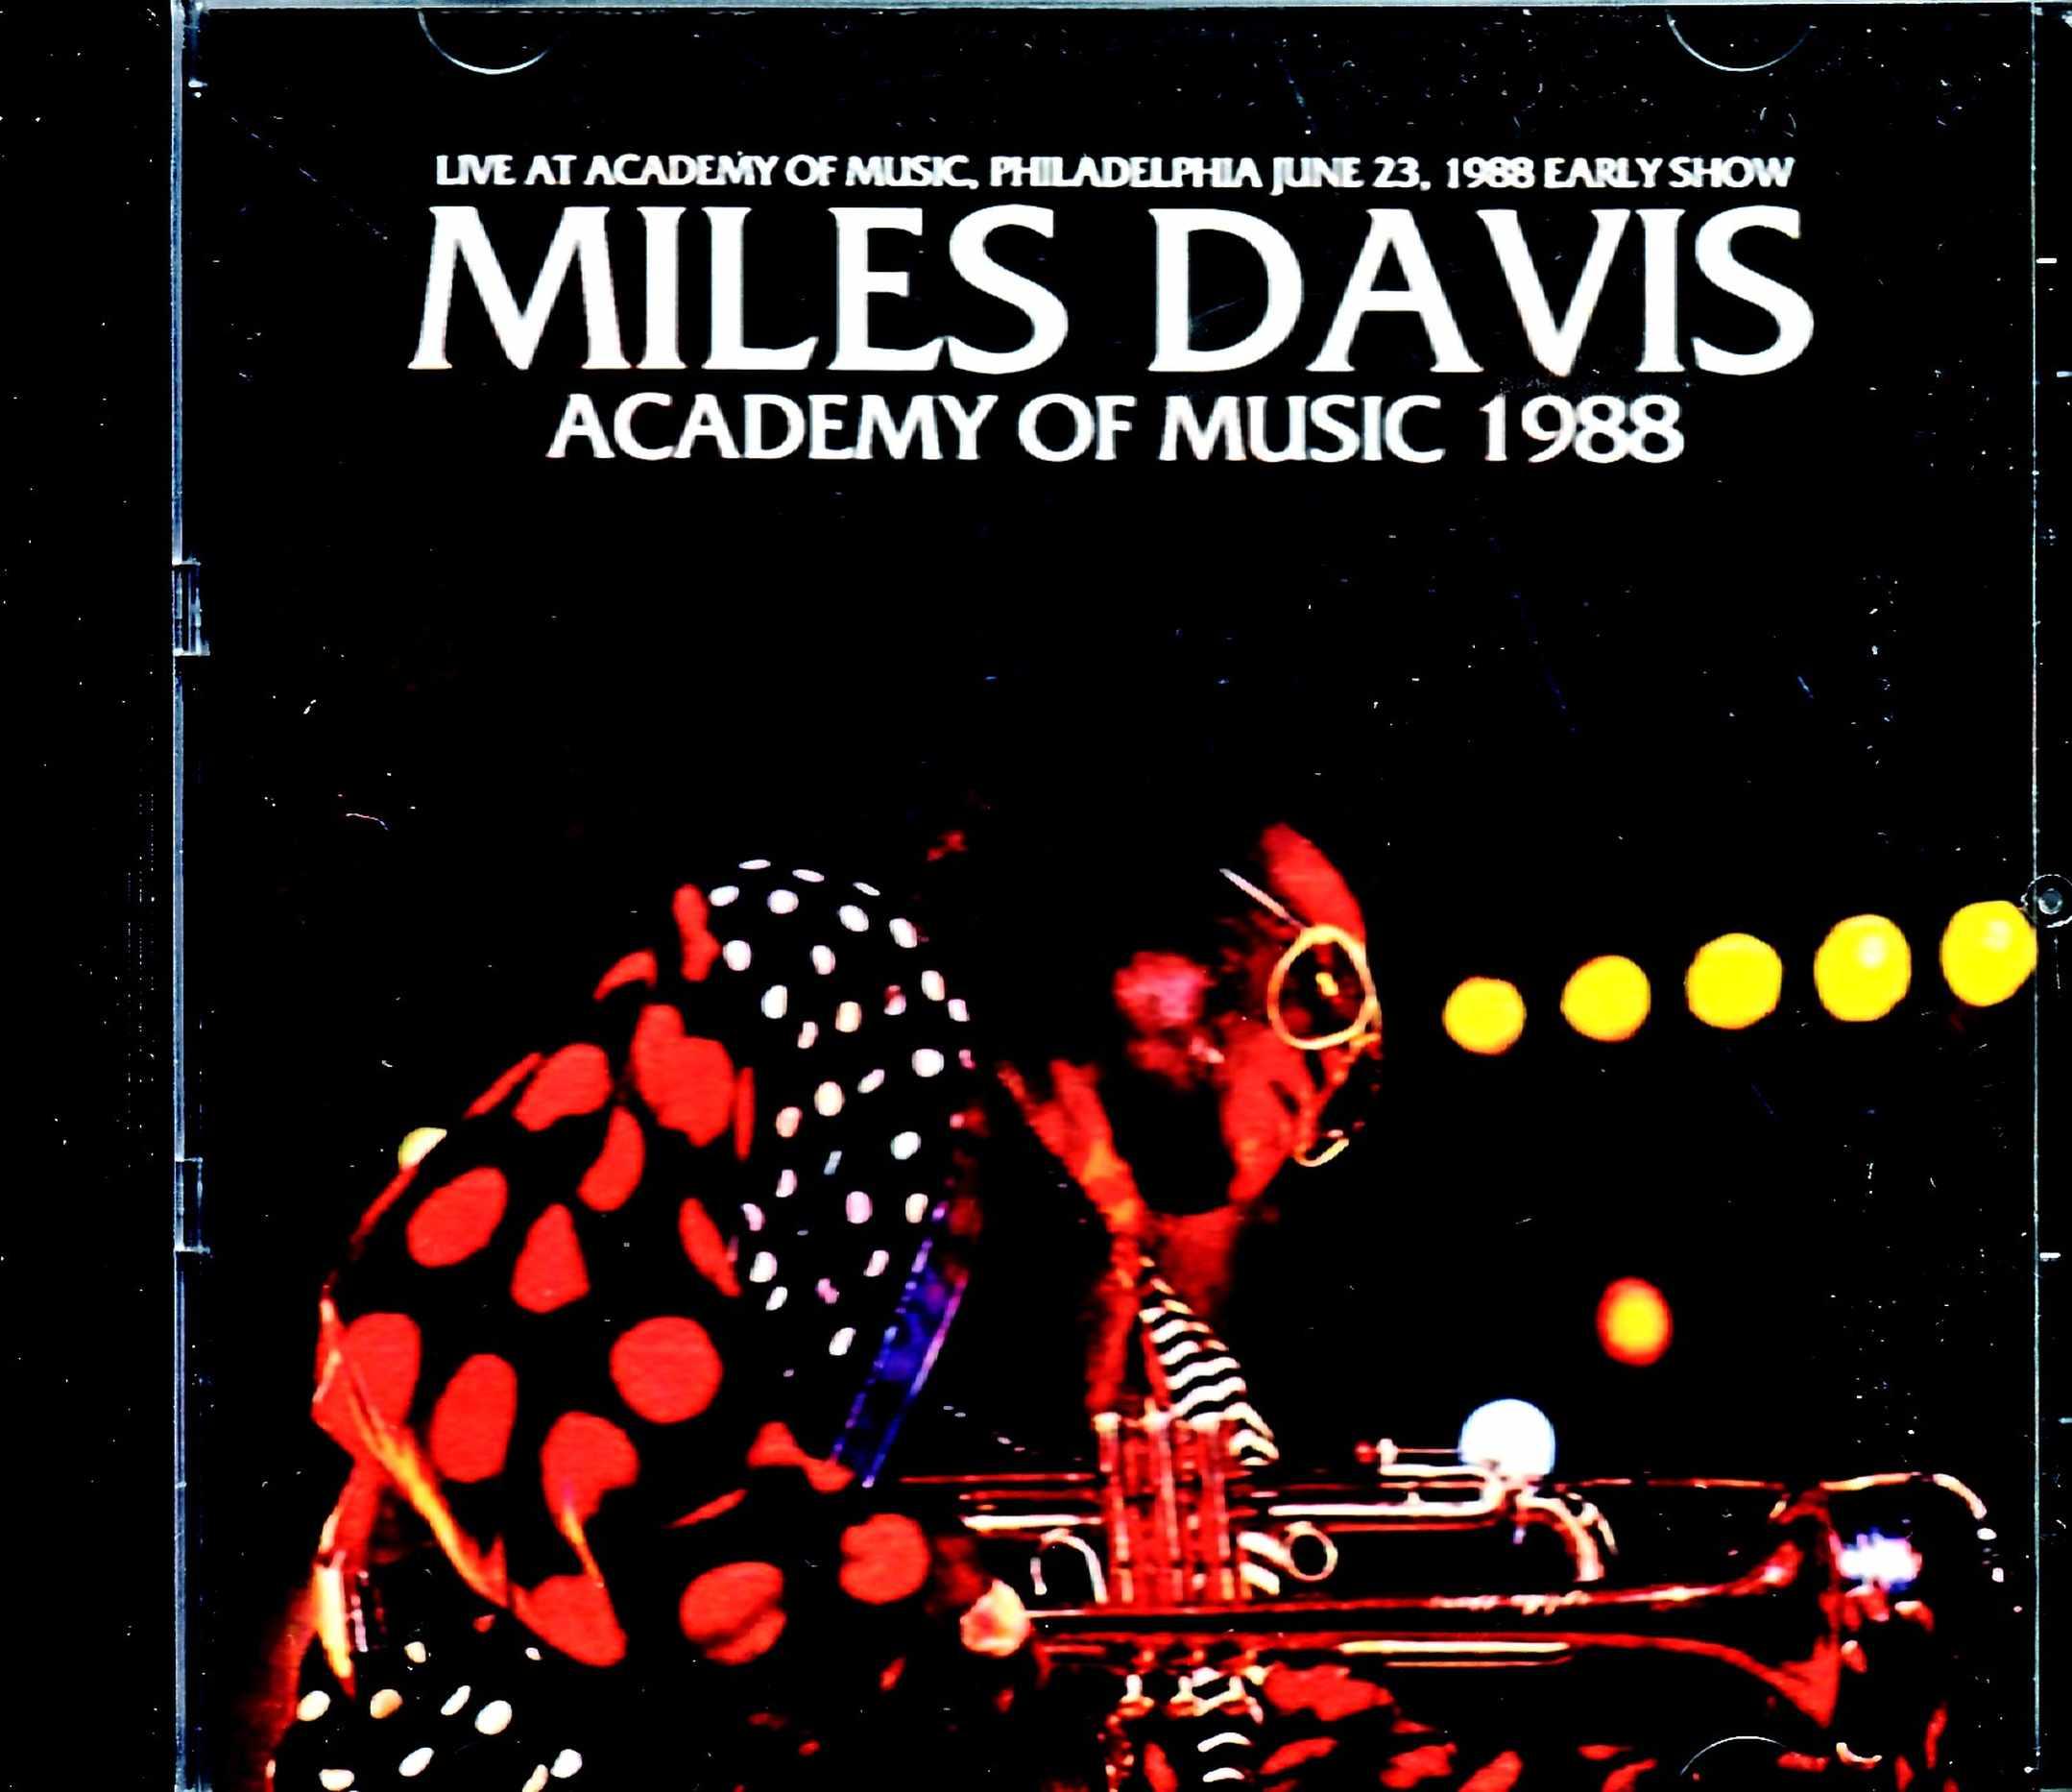 Miles Davis Kenny Garrett マイルス・デイビス ケニー・ギャレット/PA,USA 1988 Early Show